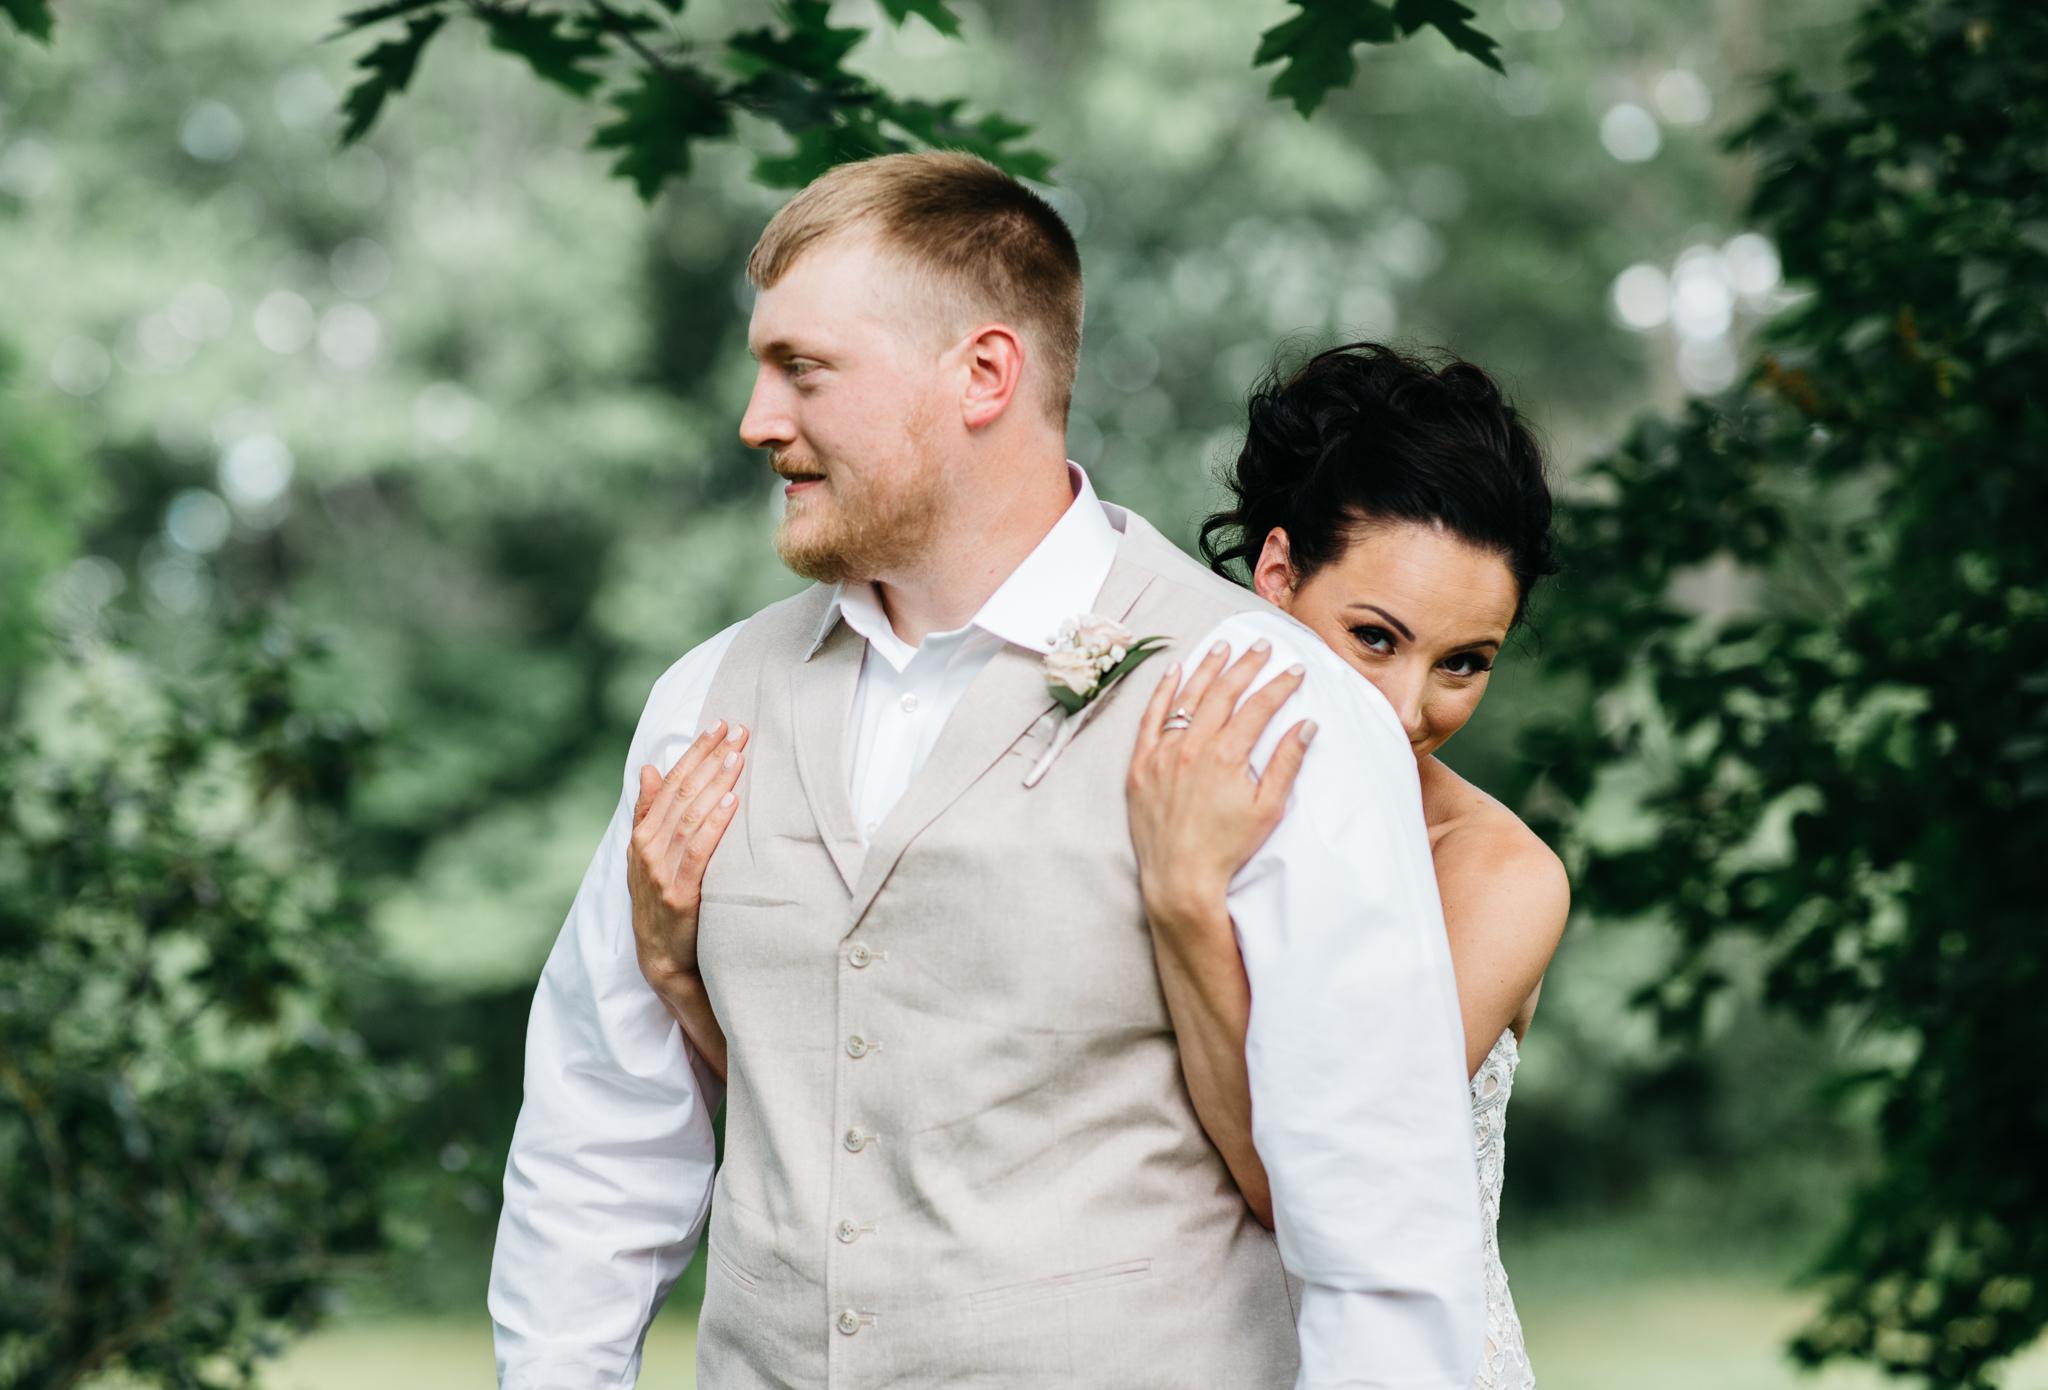 dayton-maine-wedding-photographer-bride-groom-a barn-hitching post.jpg